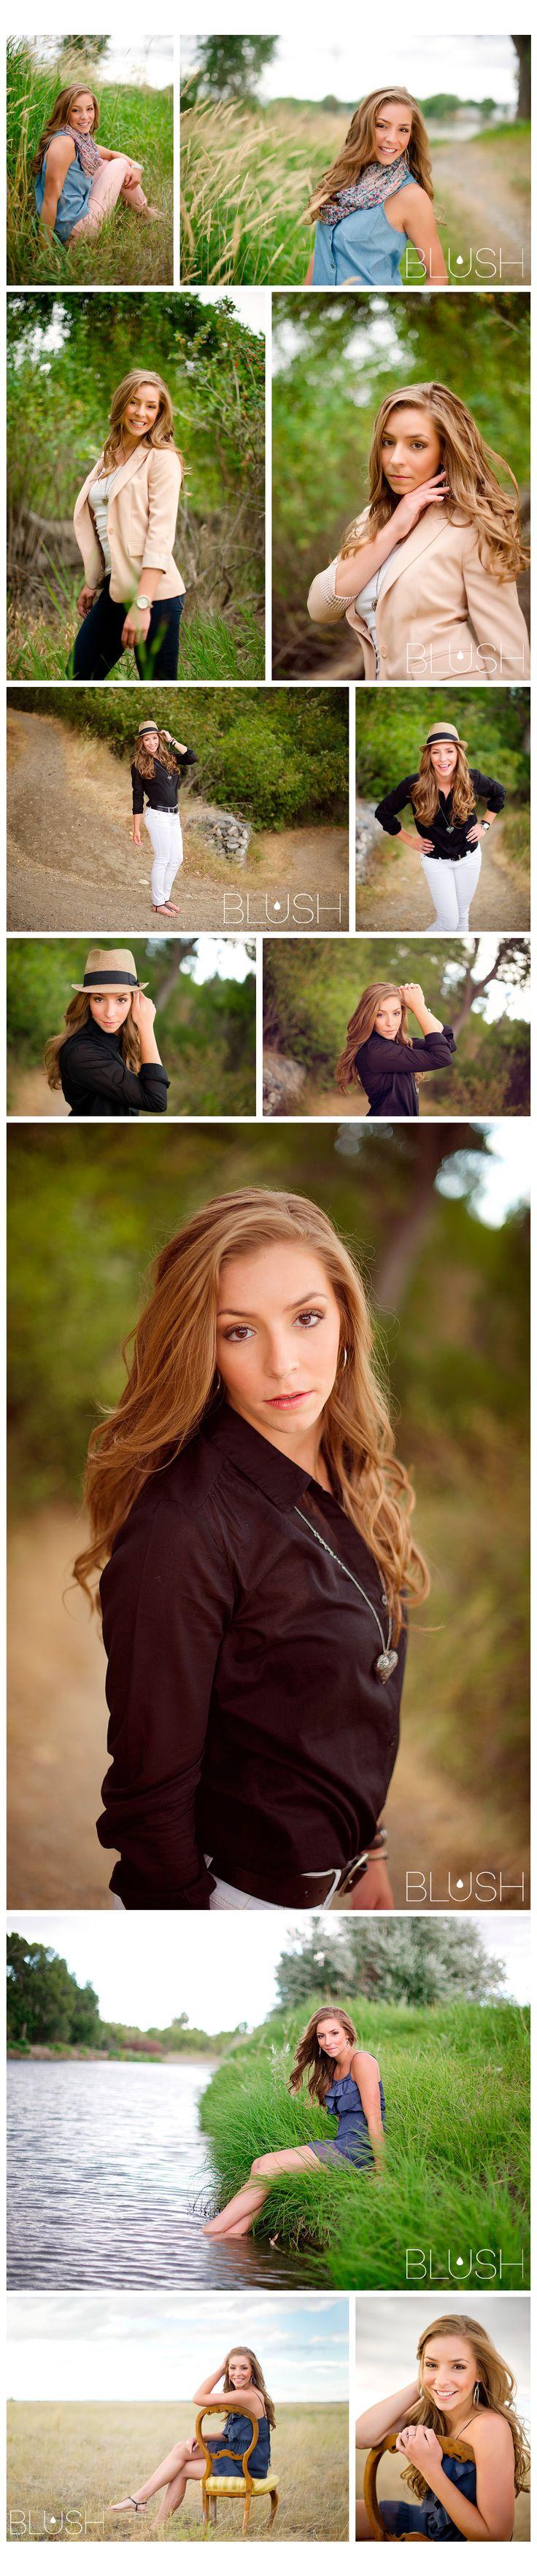 best images about senior portraits on pinterest senior session